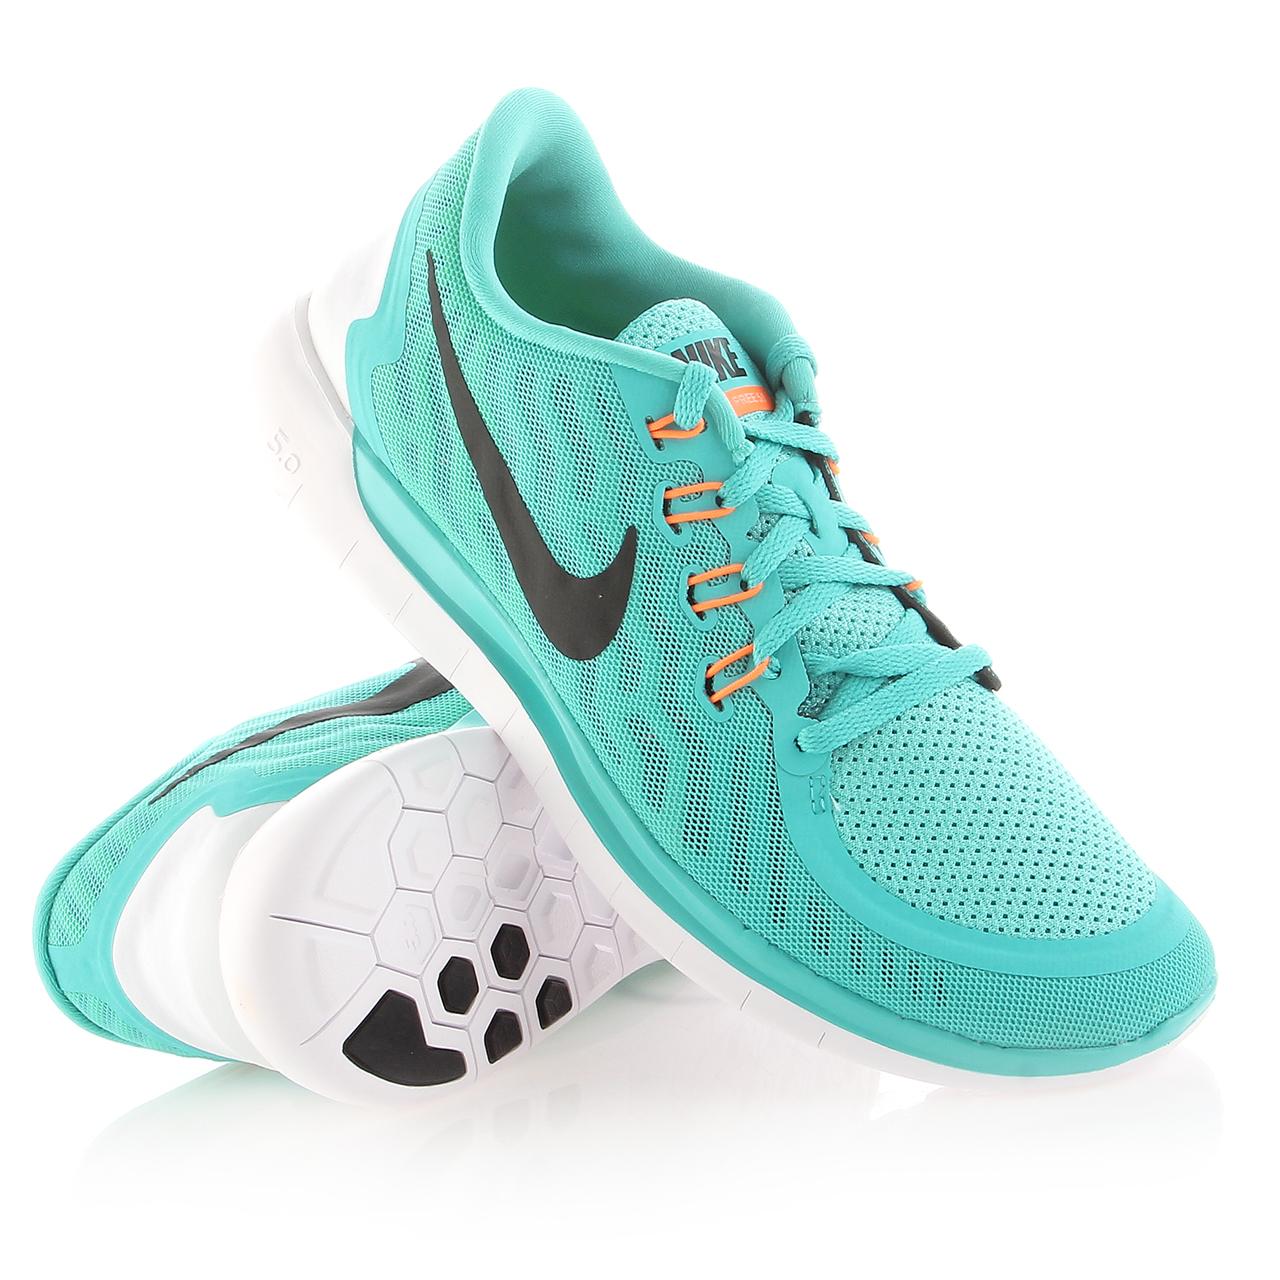 8def1b470b ... Para Hombre; Tenis Nike Air Shox 599899-11 100% Originales Unisex; nike  shox roadster mercadolibre; tenis nike shox stunner; Tenis Nike Free 5.0  2015 ...